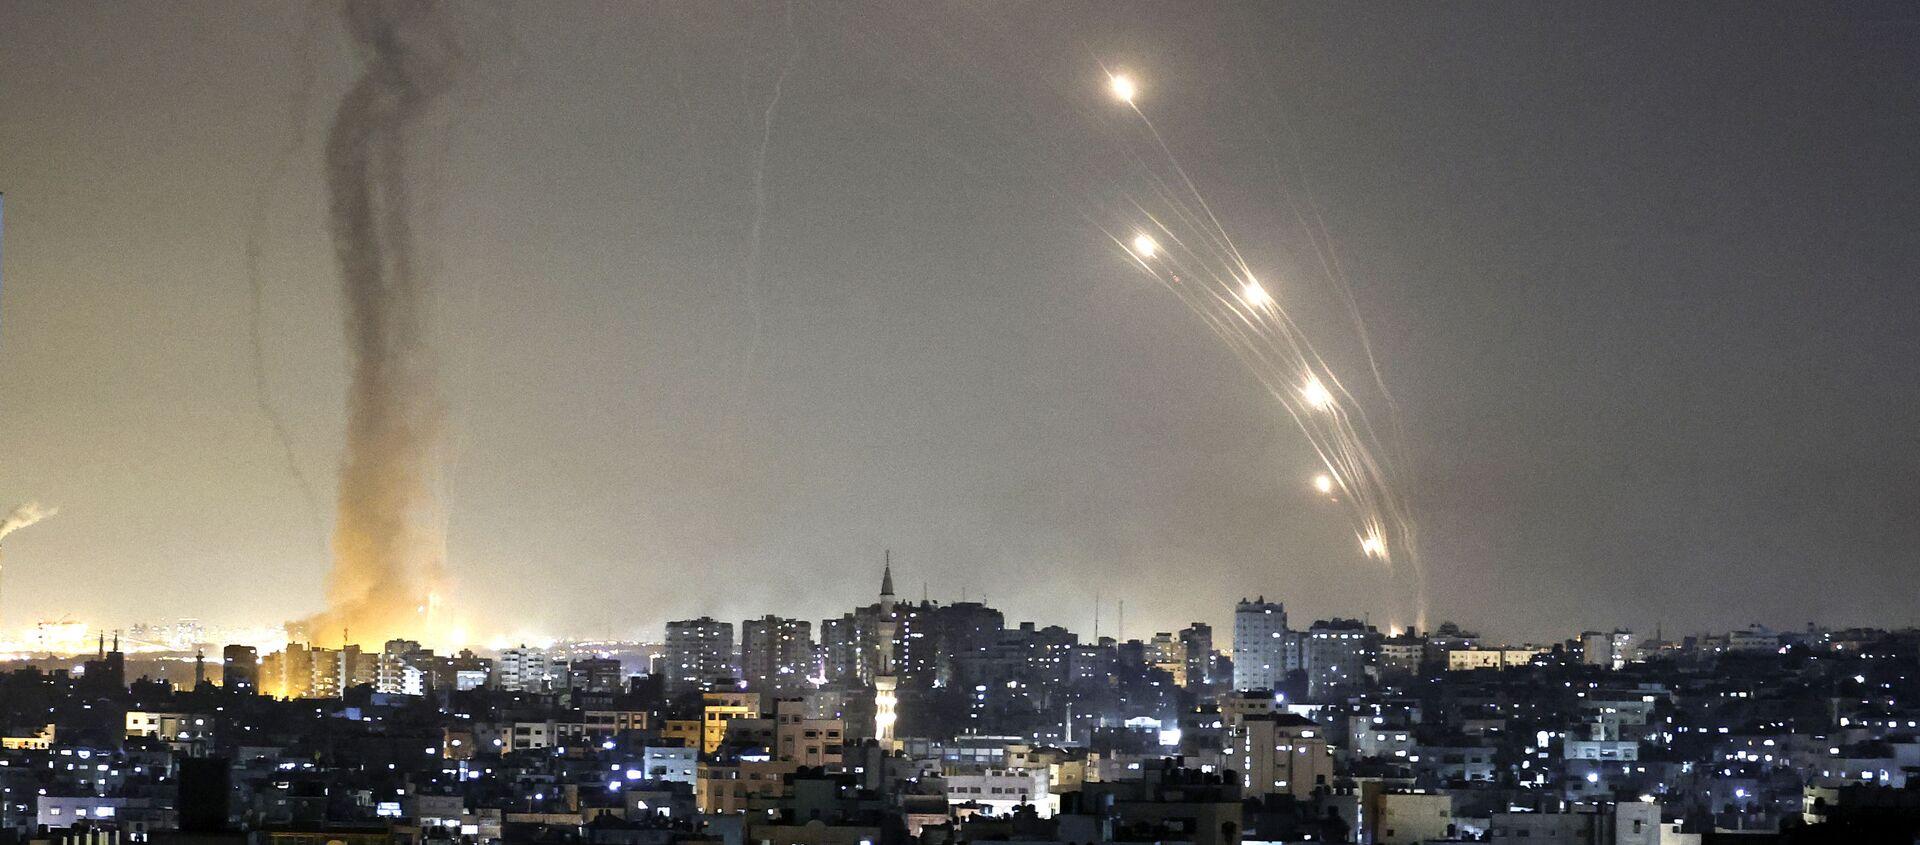 Ракете лансиране из Газе лете према Тел Авиву  - Sputnik Србија, 1920, 12.05.2021